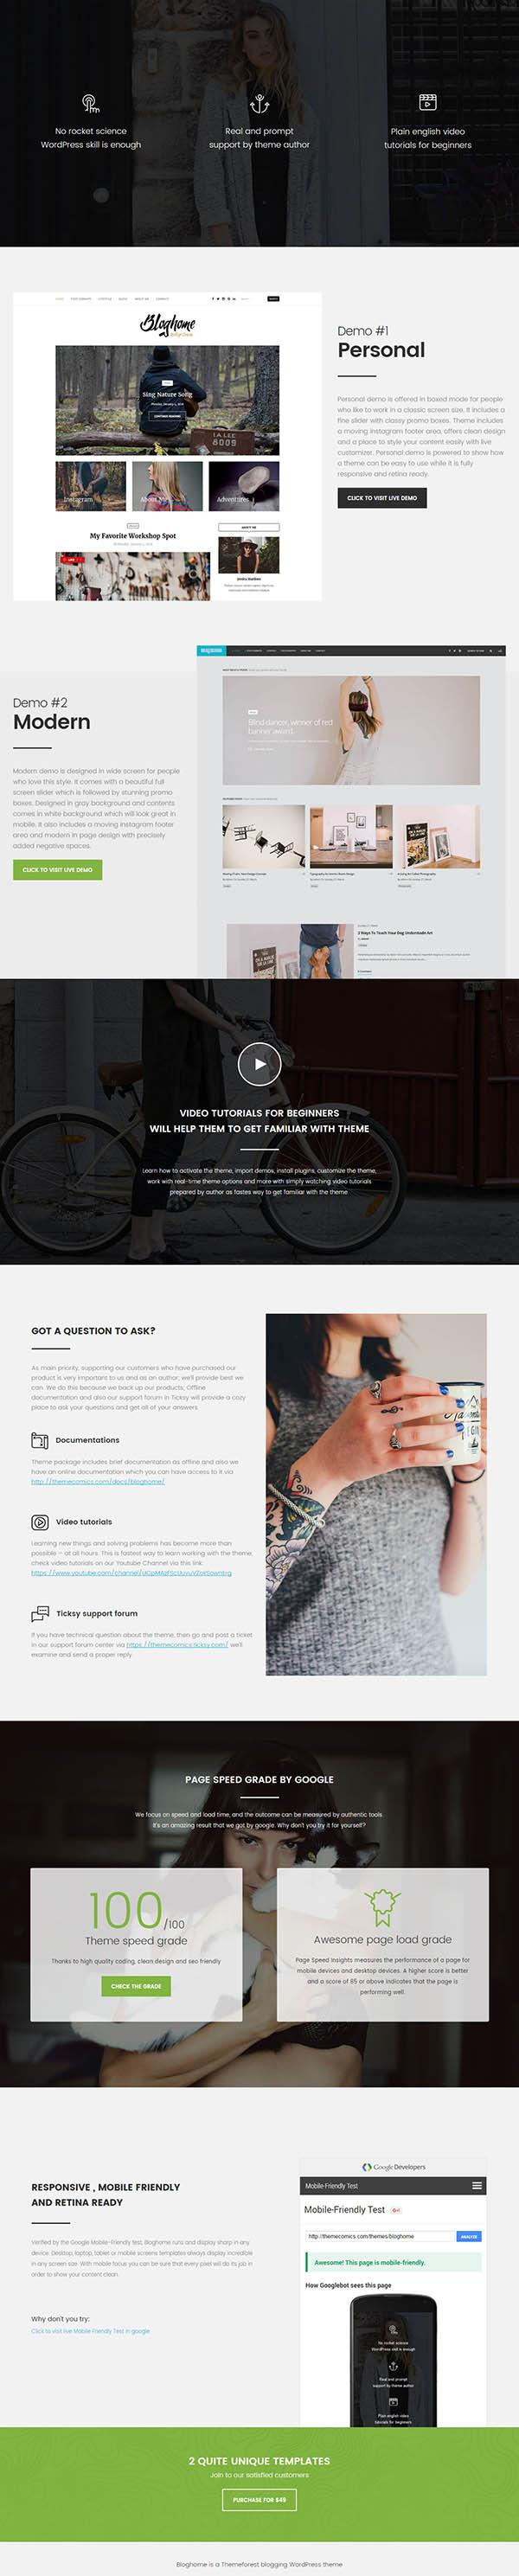 Blog Home : Responsive WordPress Blog Theme